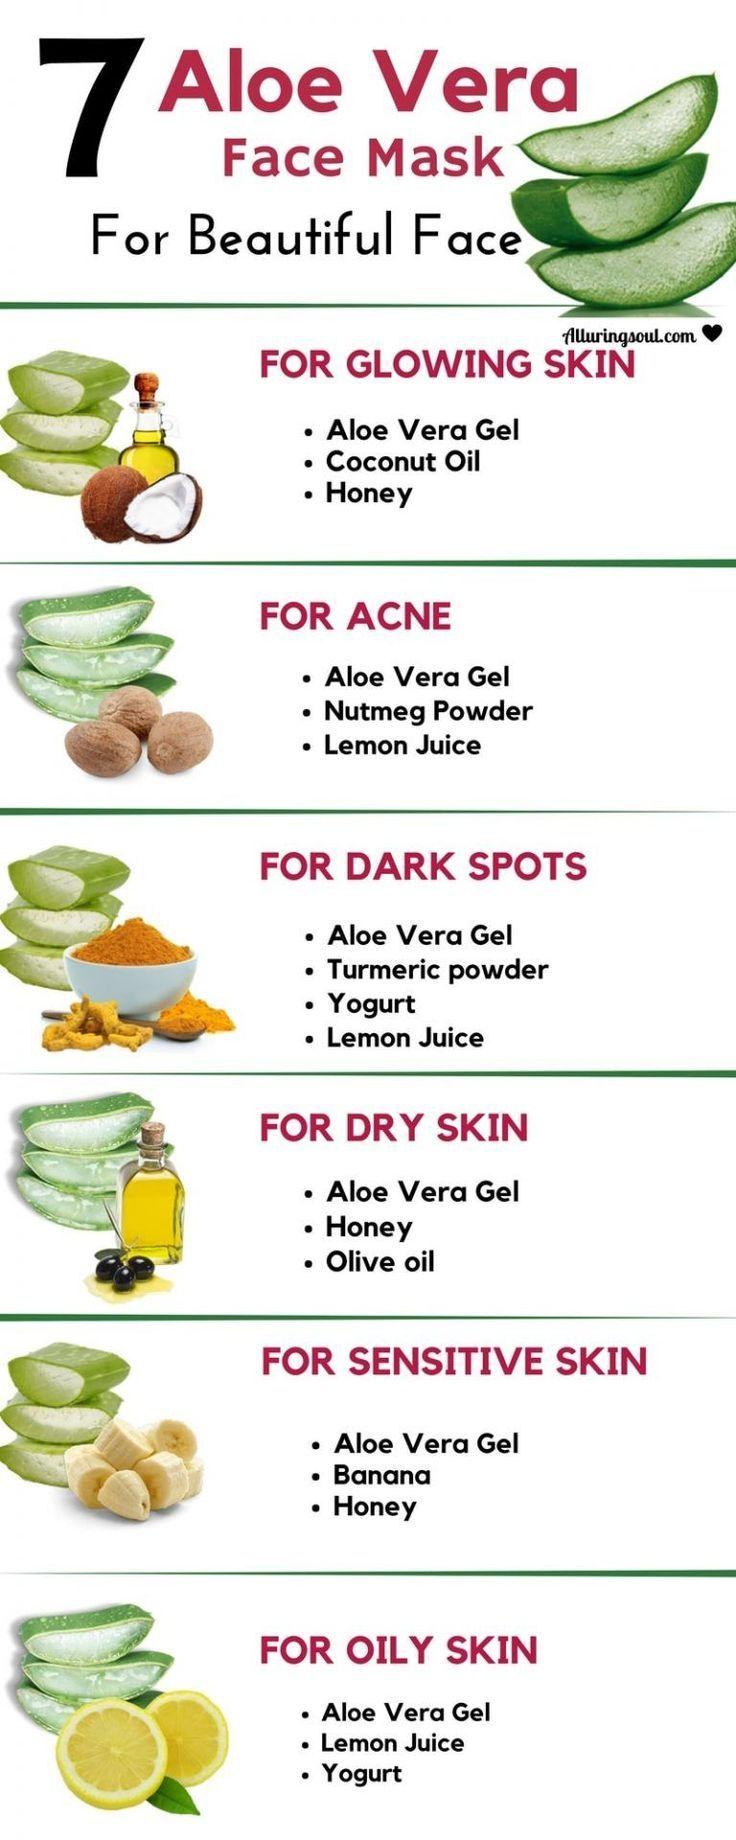 7 Aloe Vera Face Mask For Bright And Beautiful Skin – Beauty Hacks